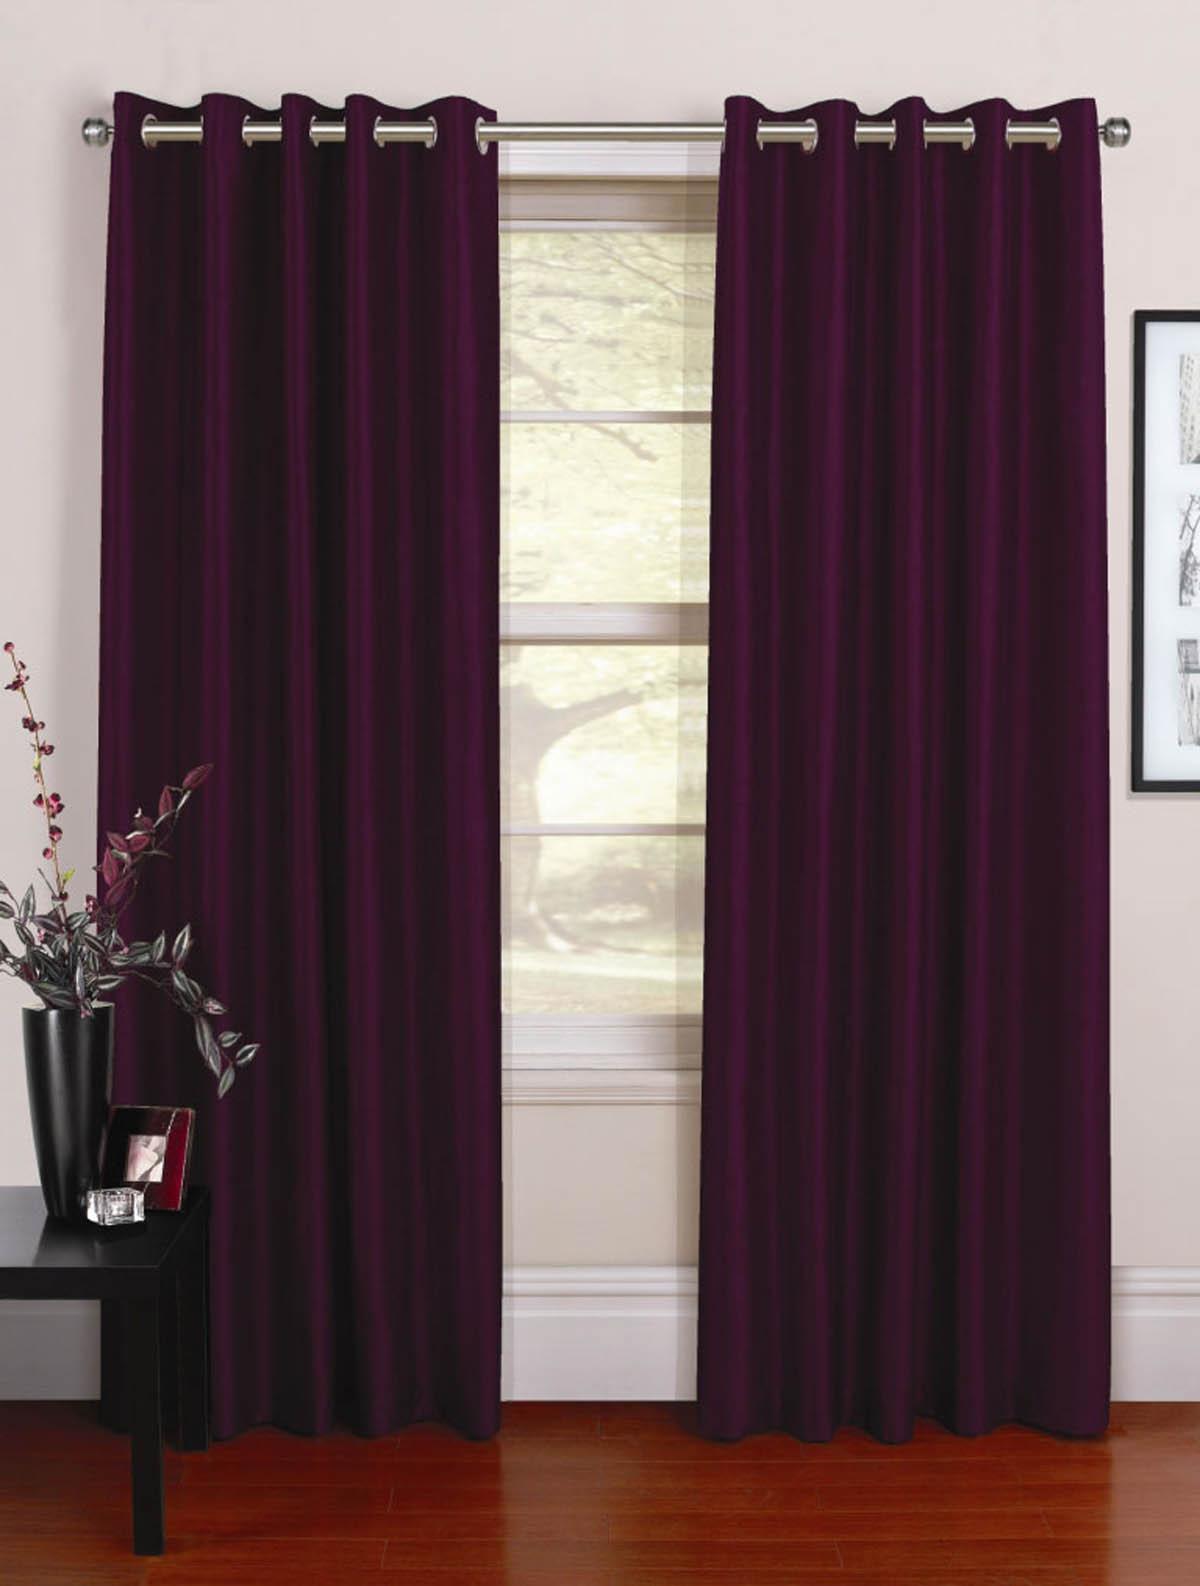 Plum curtains - Purple Curtains Venezia Ready Made Eyelet Curtains